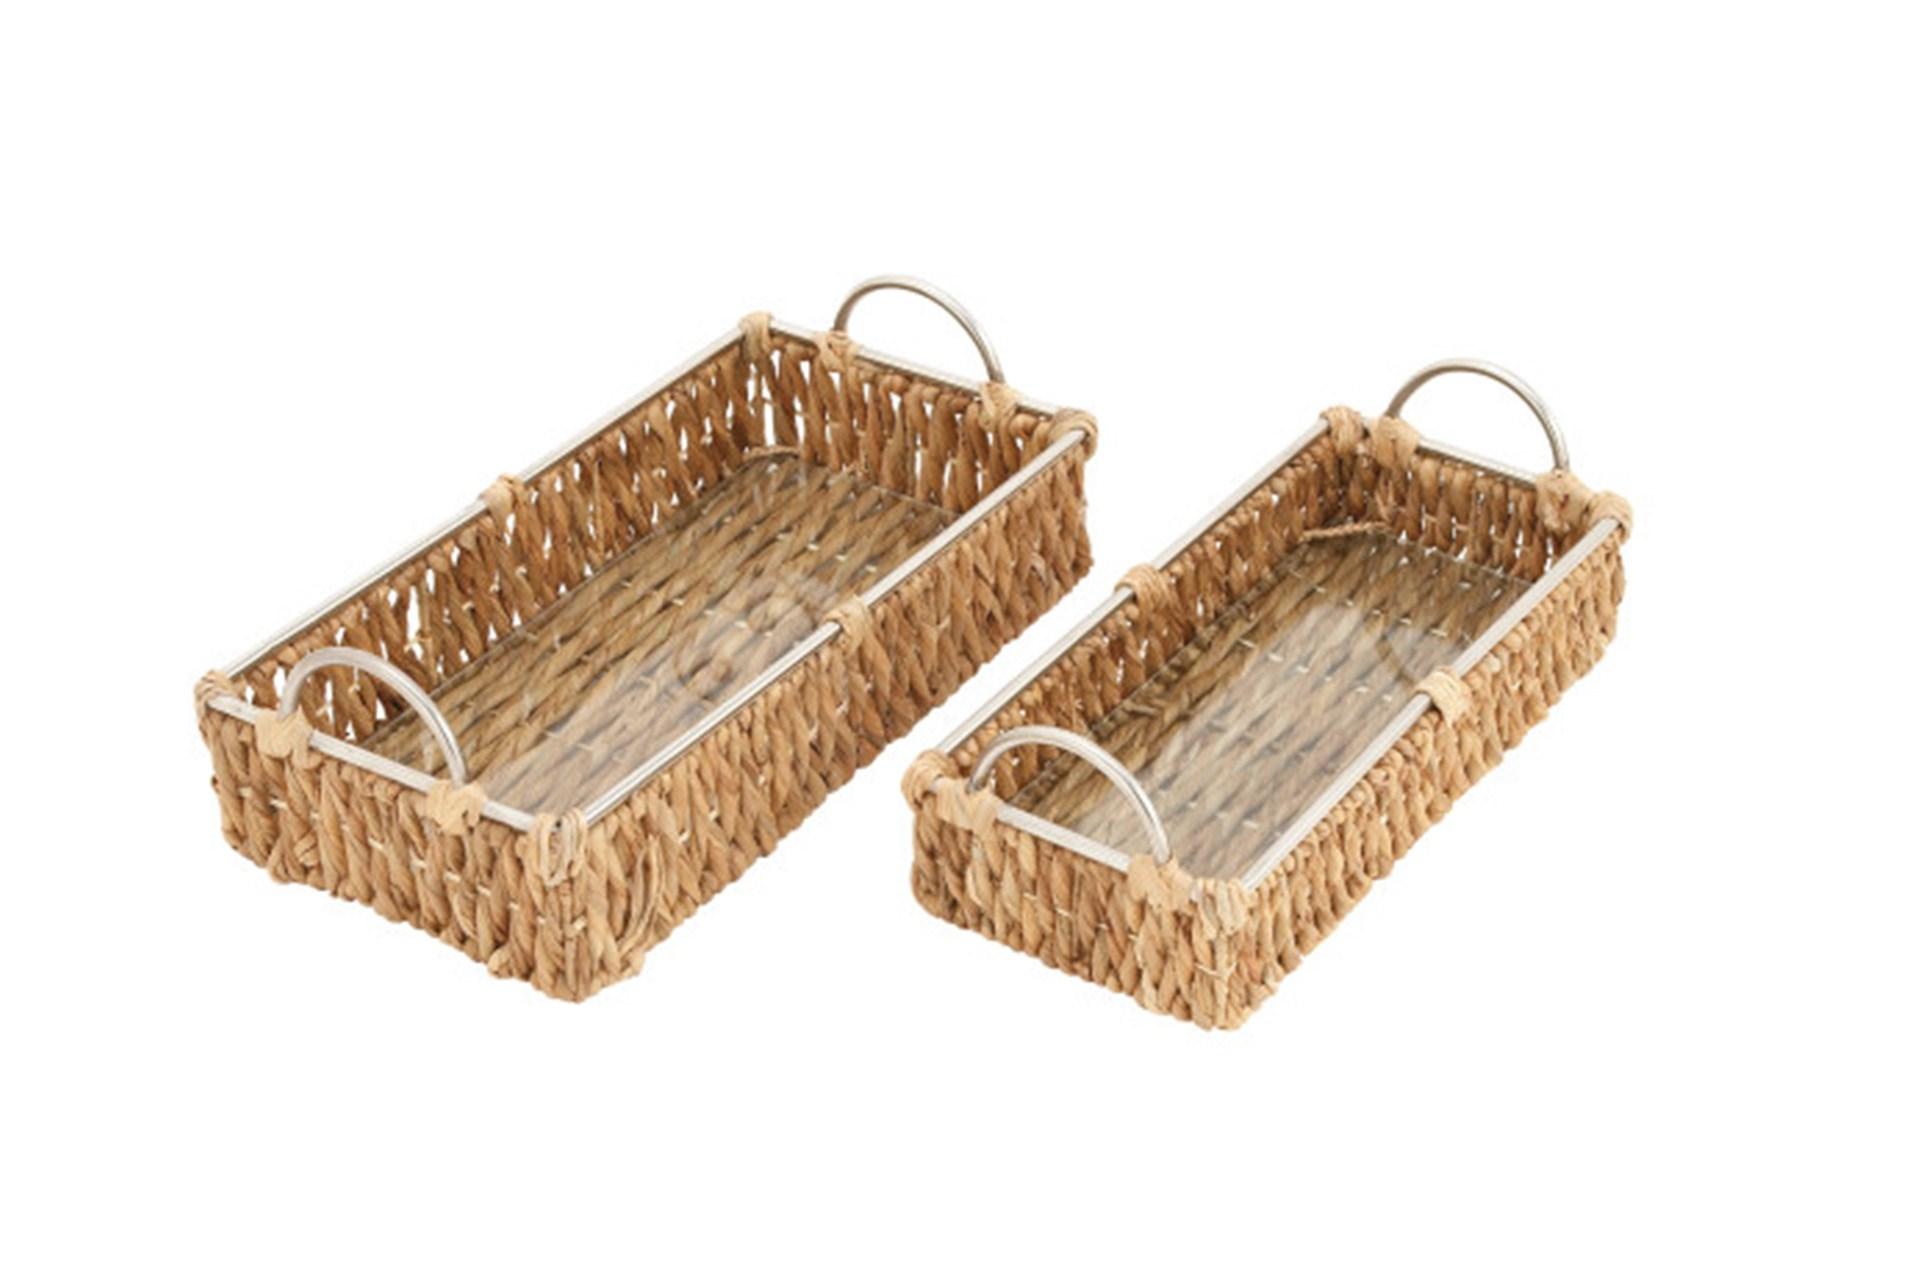 2 Piece Set Wicker Amp Metal Long Baskets Living Spaces